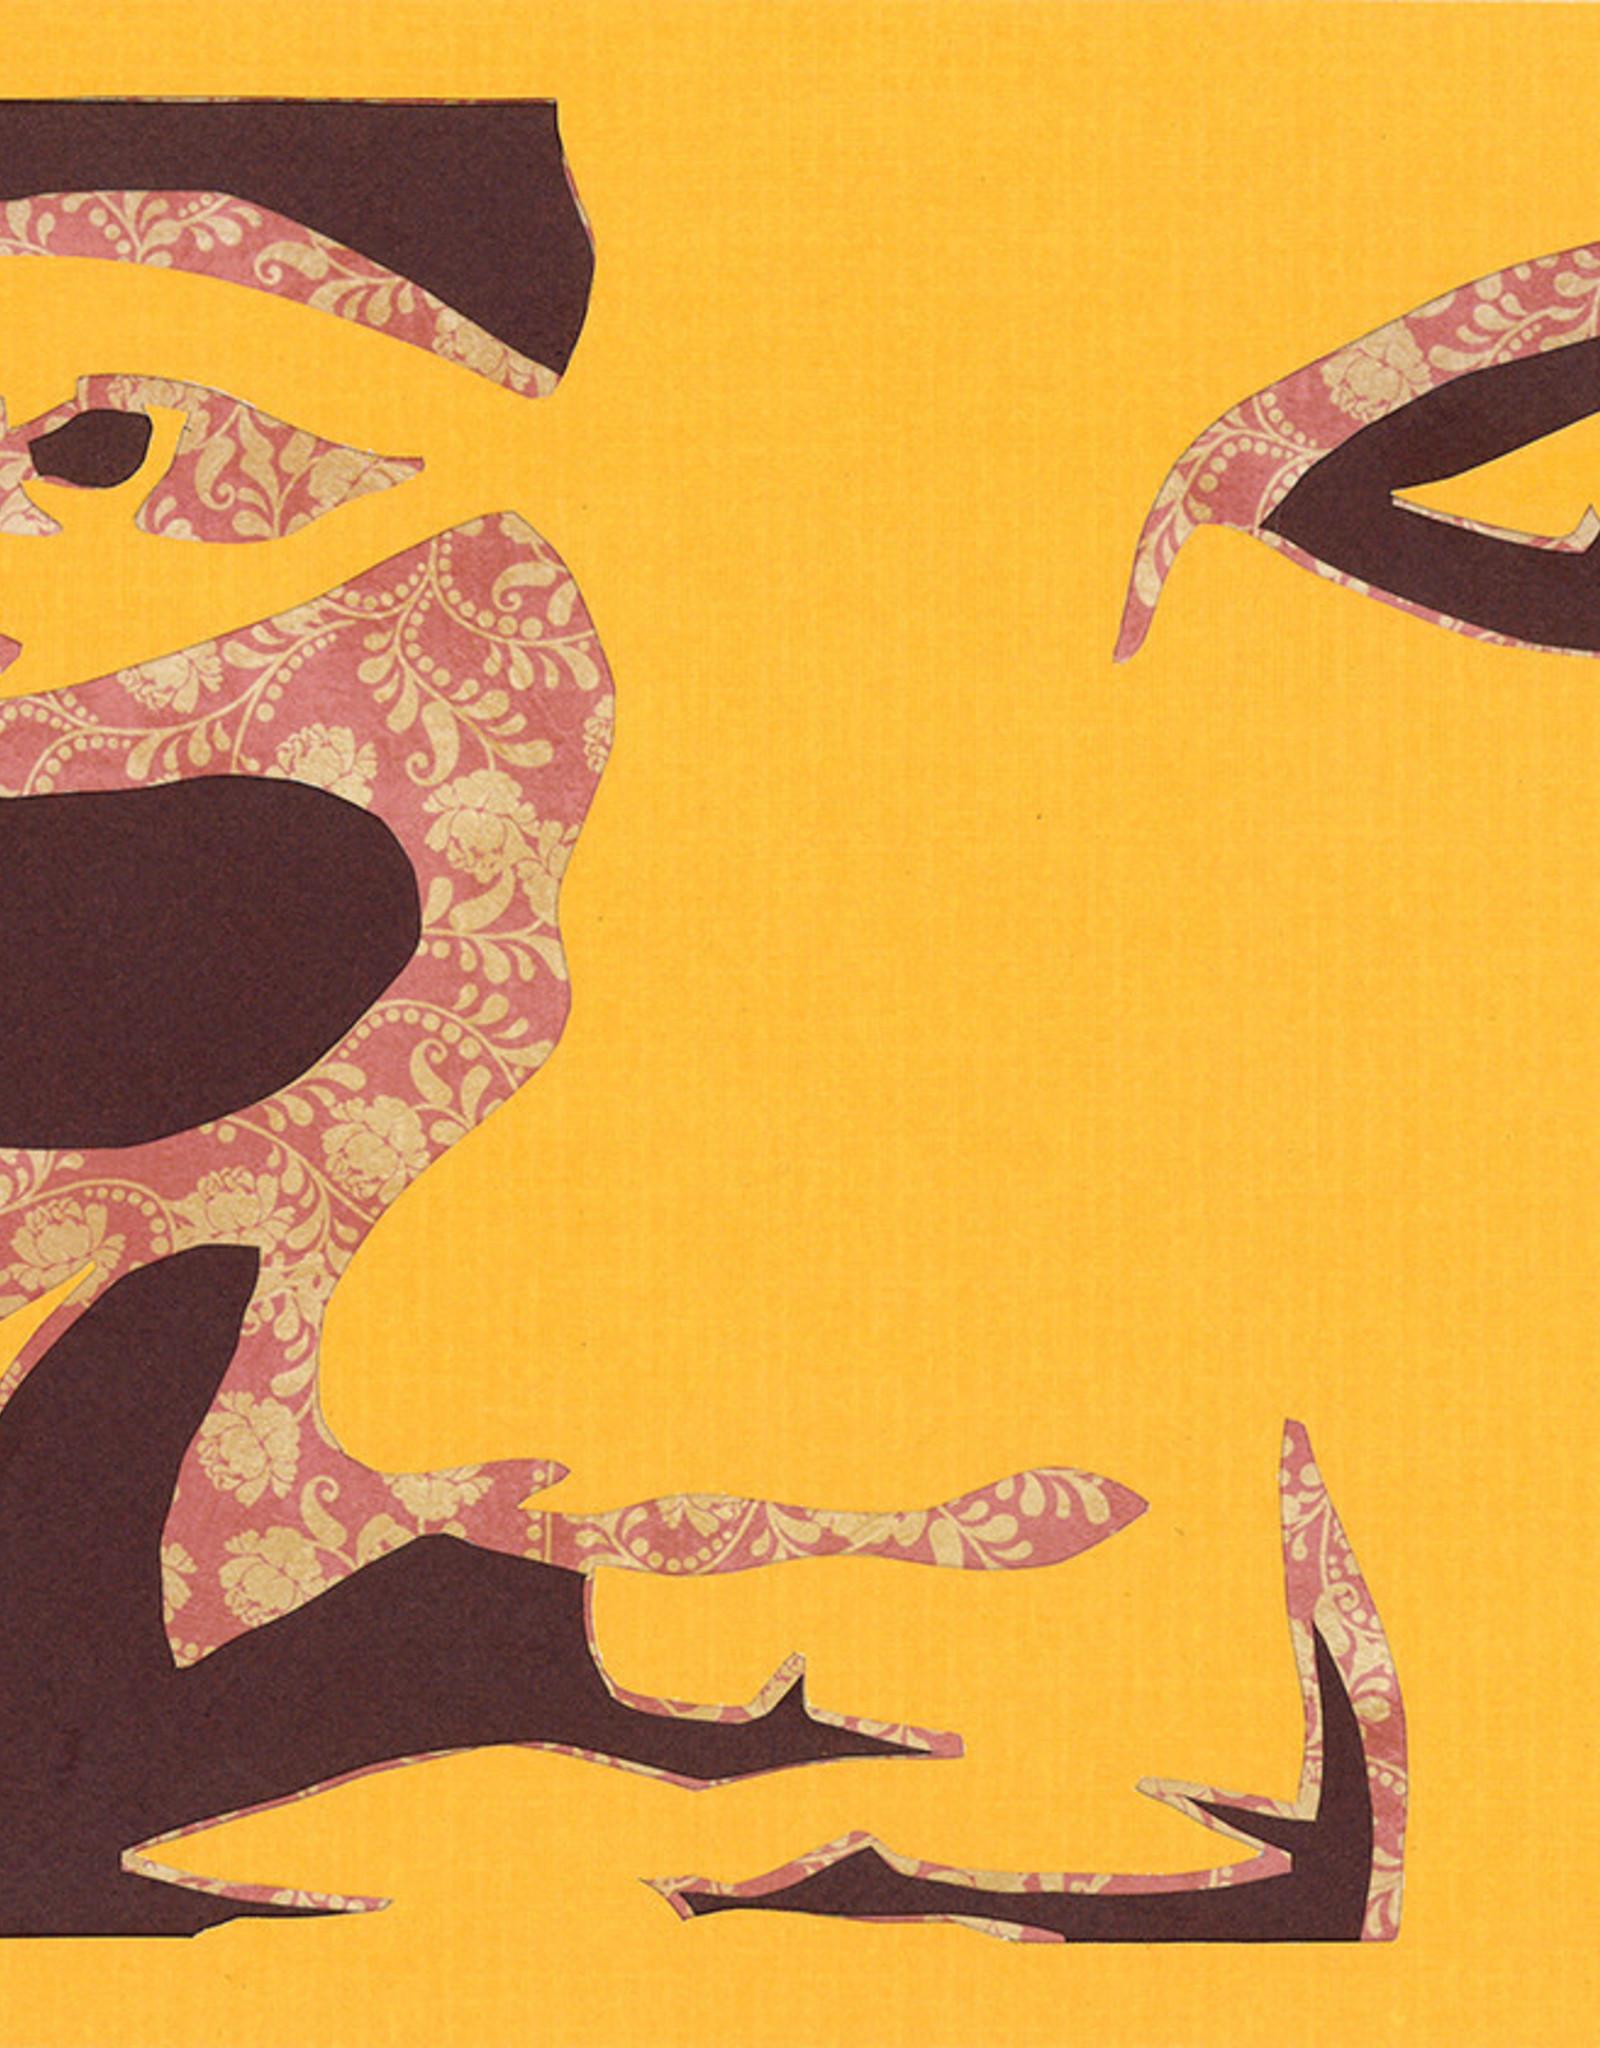 Gray Jones Face to Face -Cutout 9x12 #17